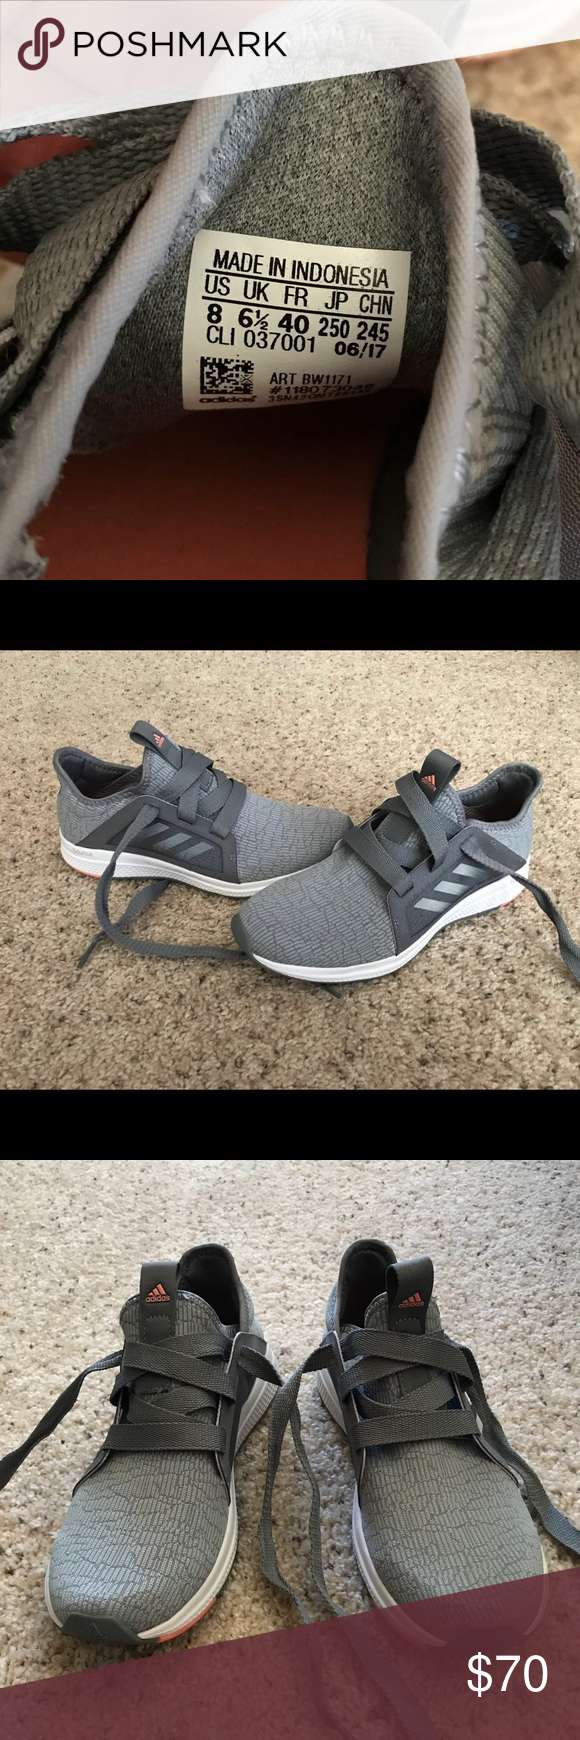 Adidas Grey Adidas Luxe Bounce Bounce Running Shoes Nuevo Adidas Nuevo luxe. 72da44e - allpoints.host